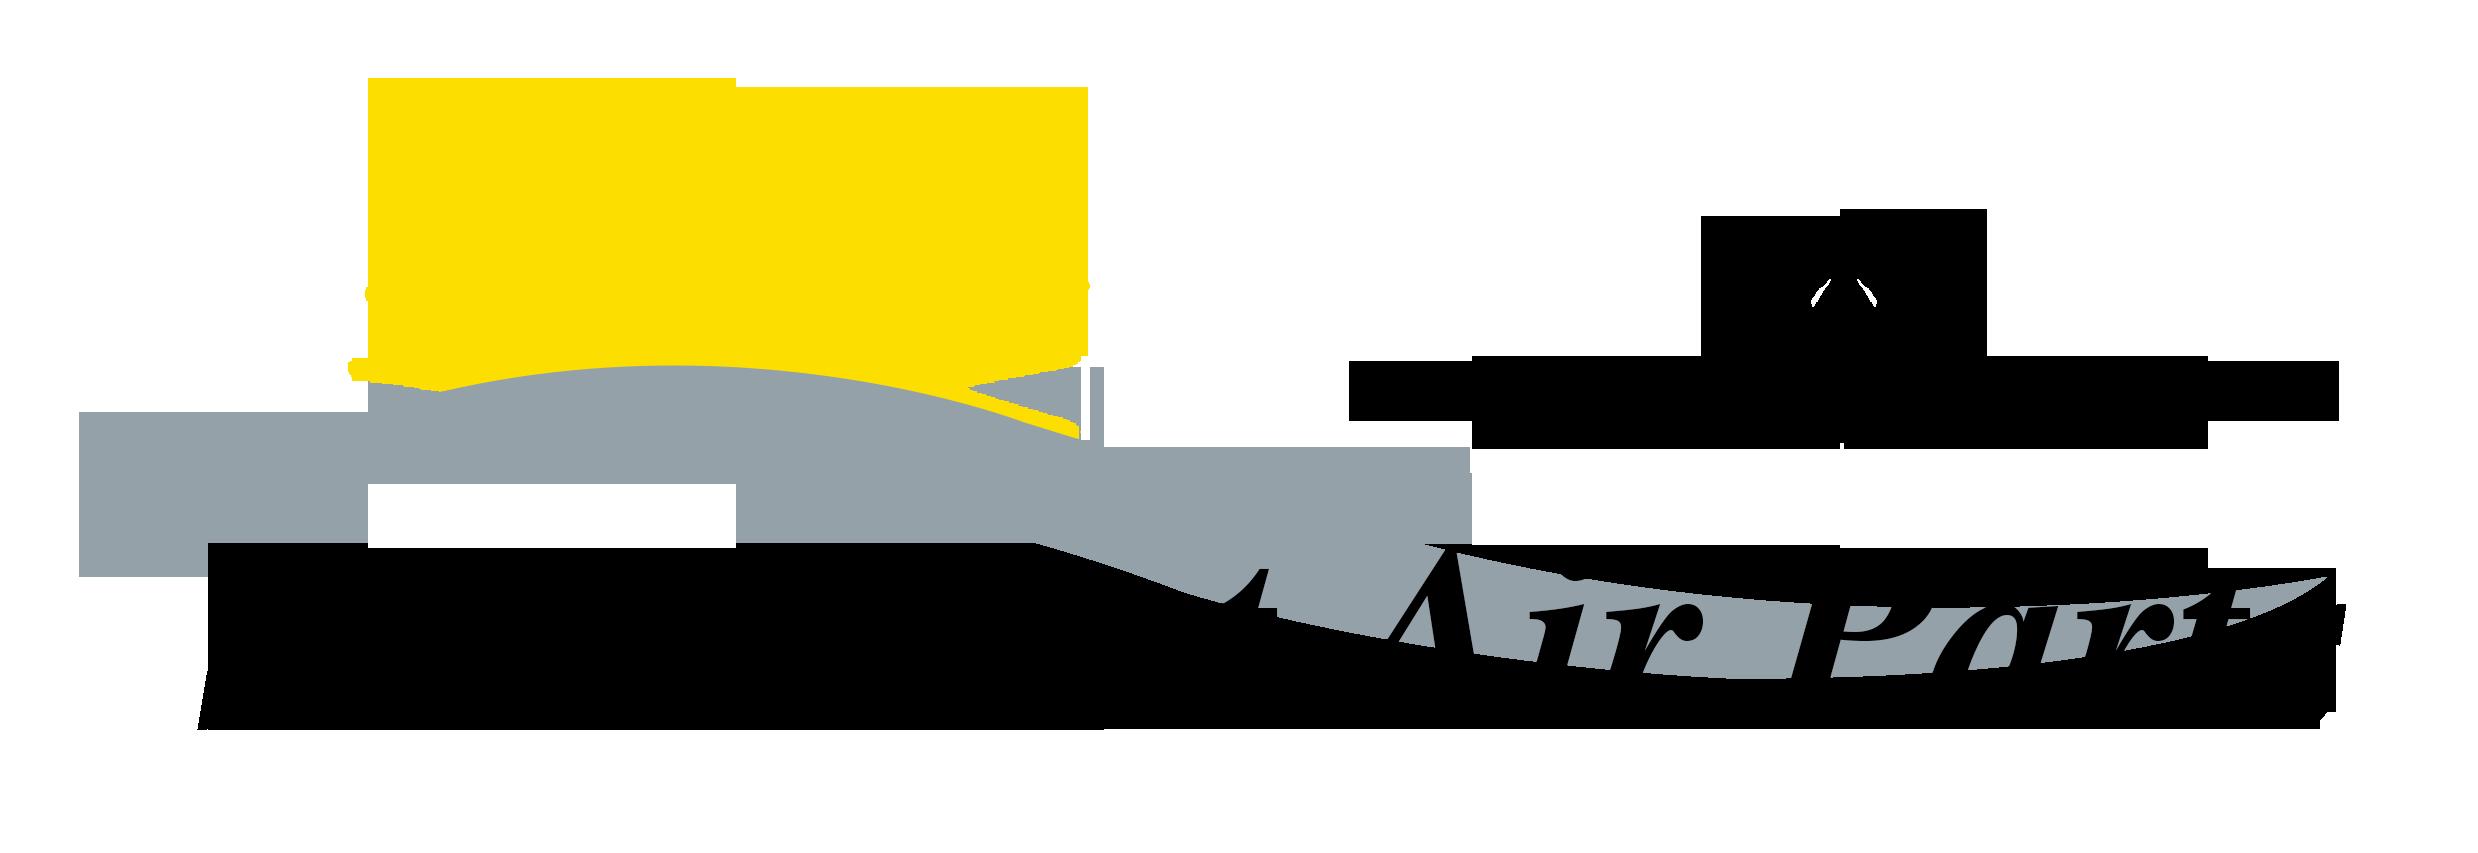 Suncoast Air Parts – General Aviation Parts Company